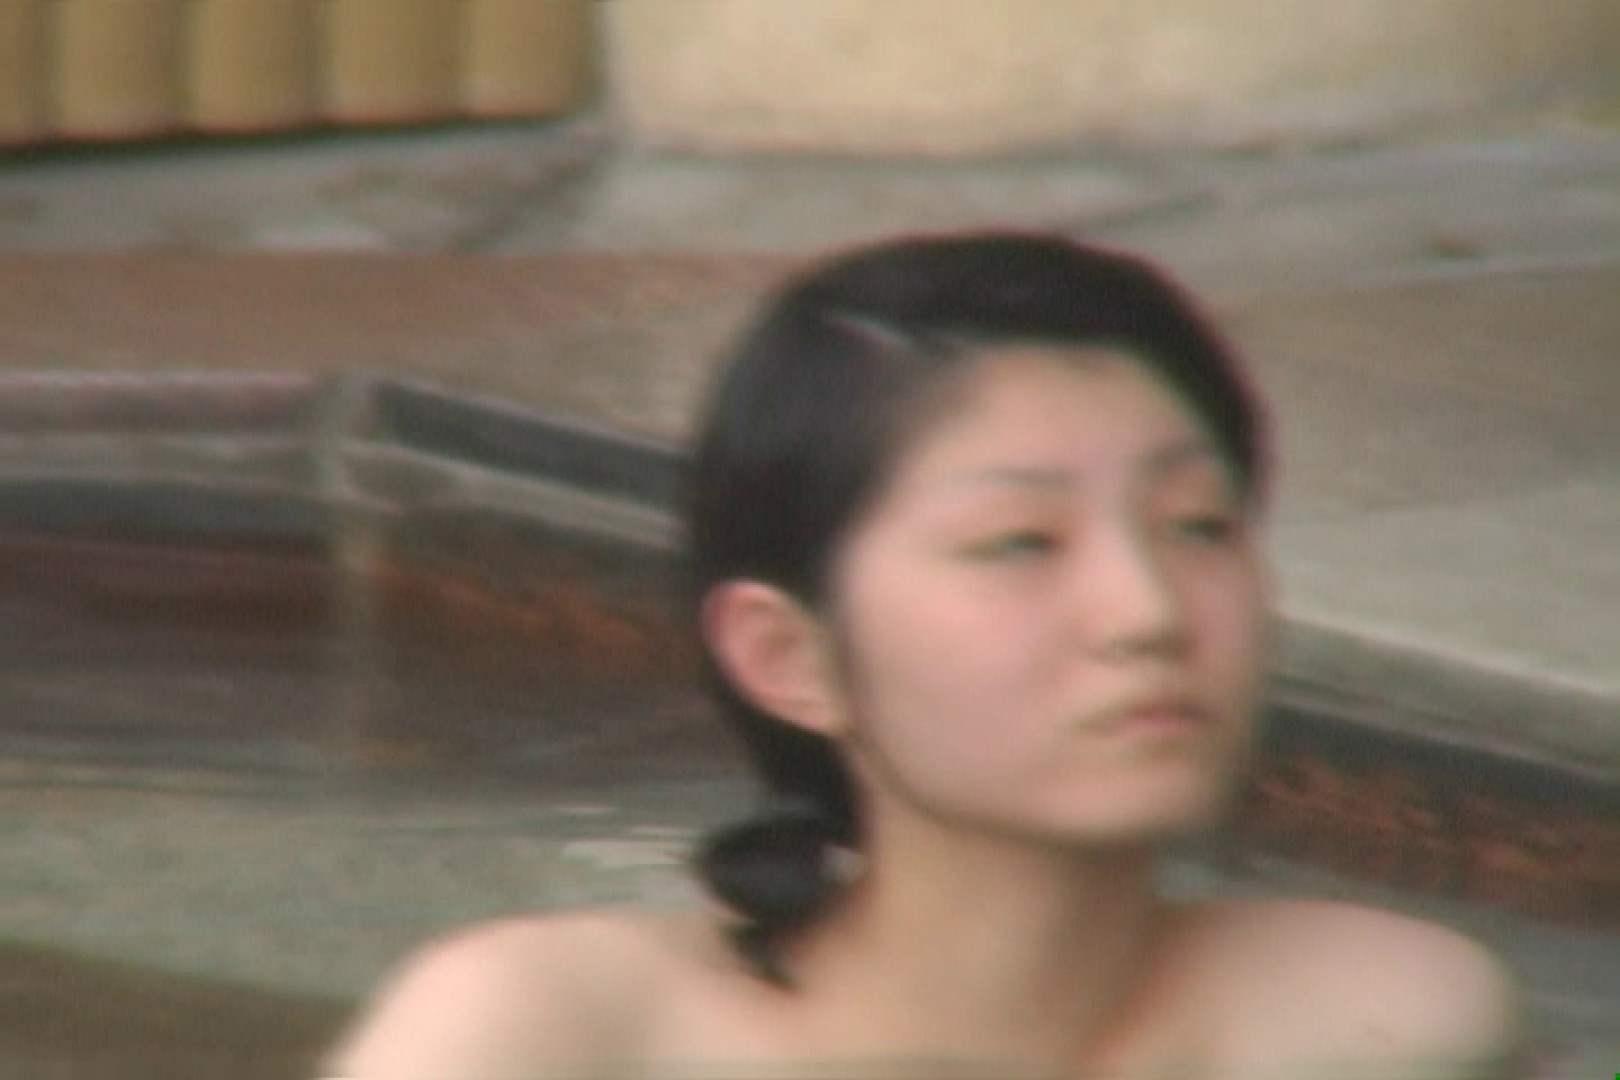 Aquaな露天風呂Vol.579 盗撮 | HなOL  53pic 34